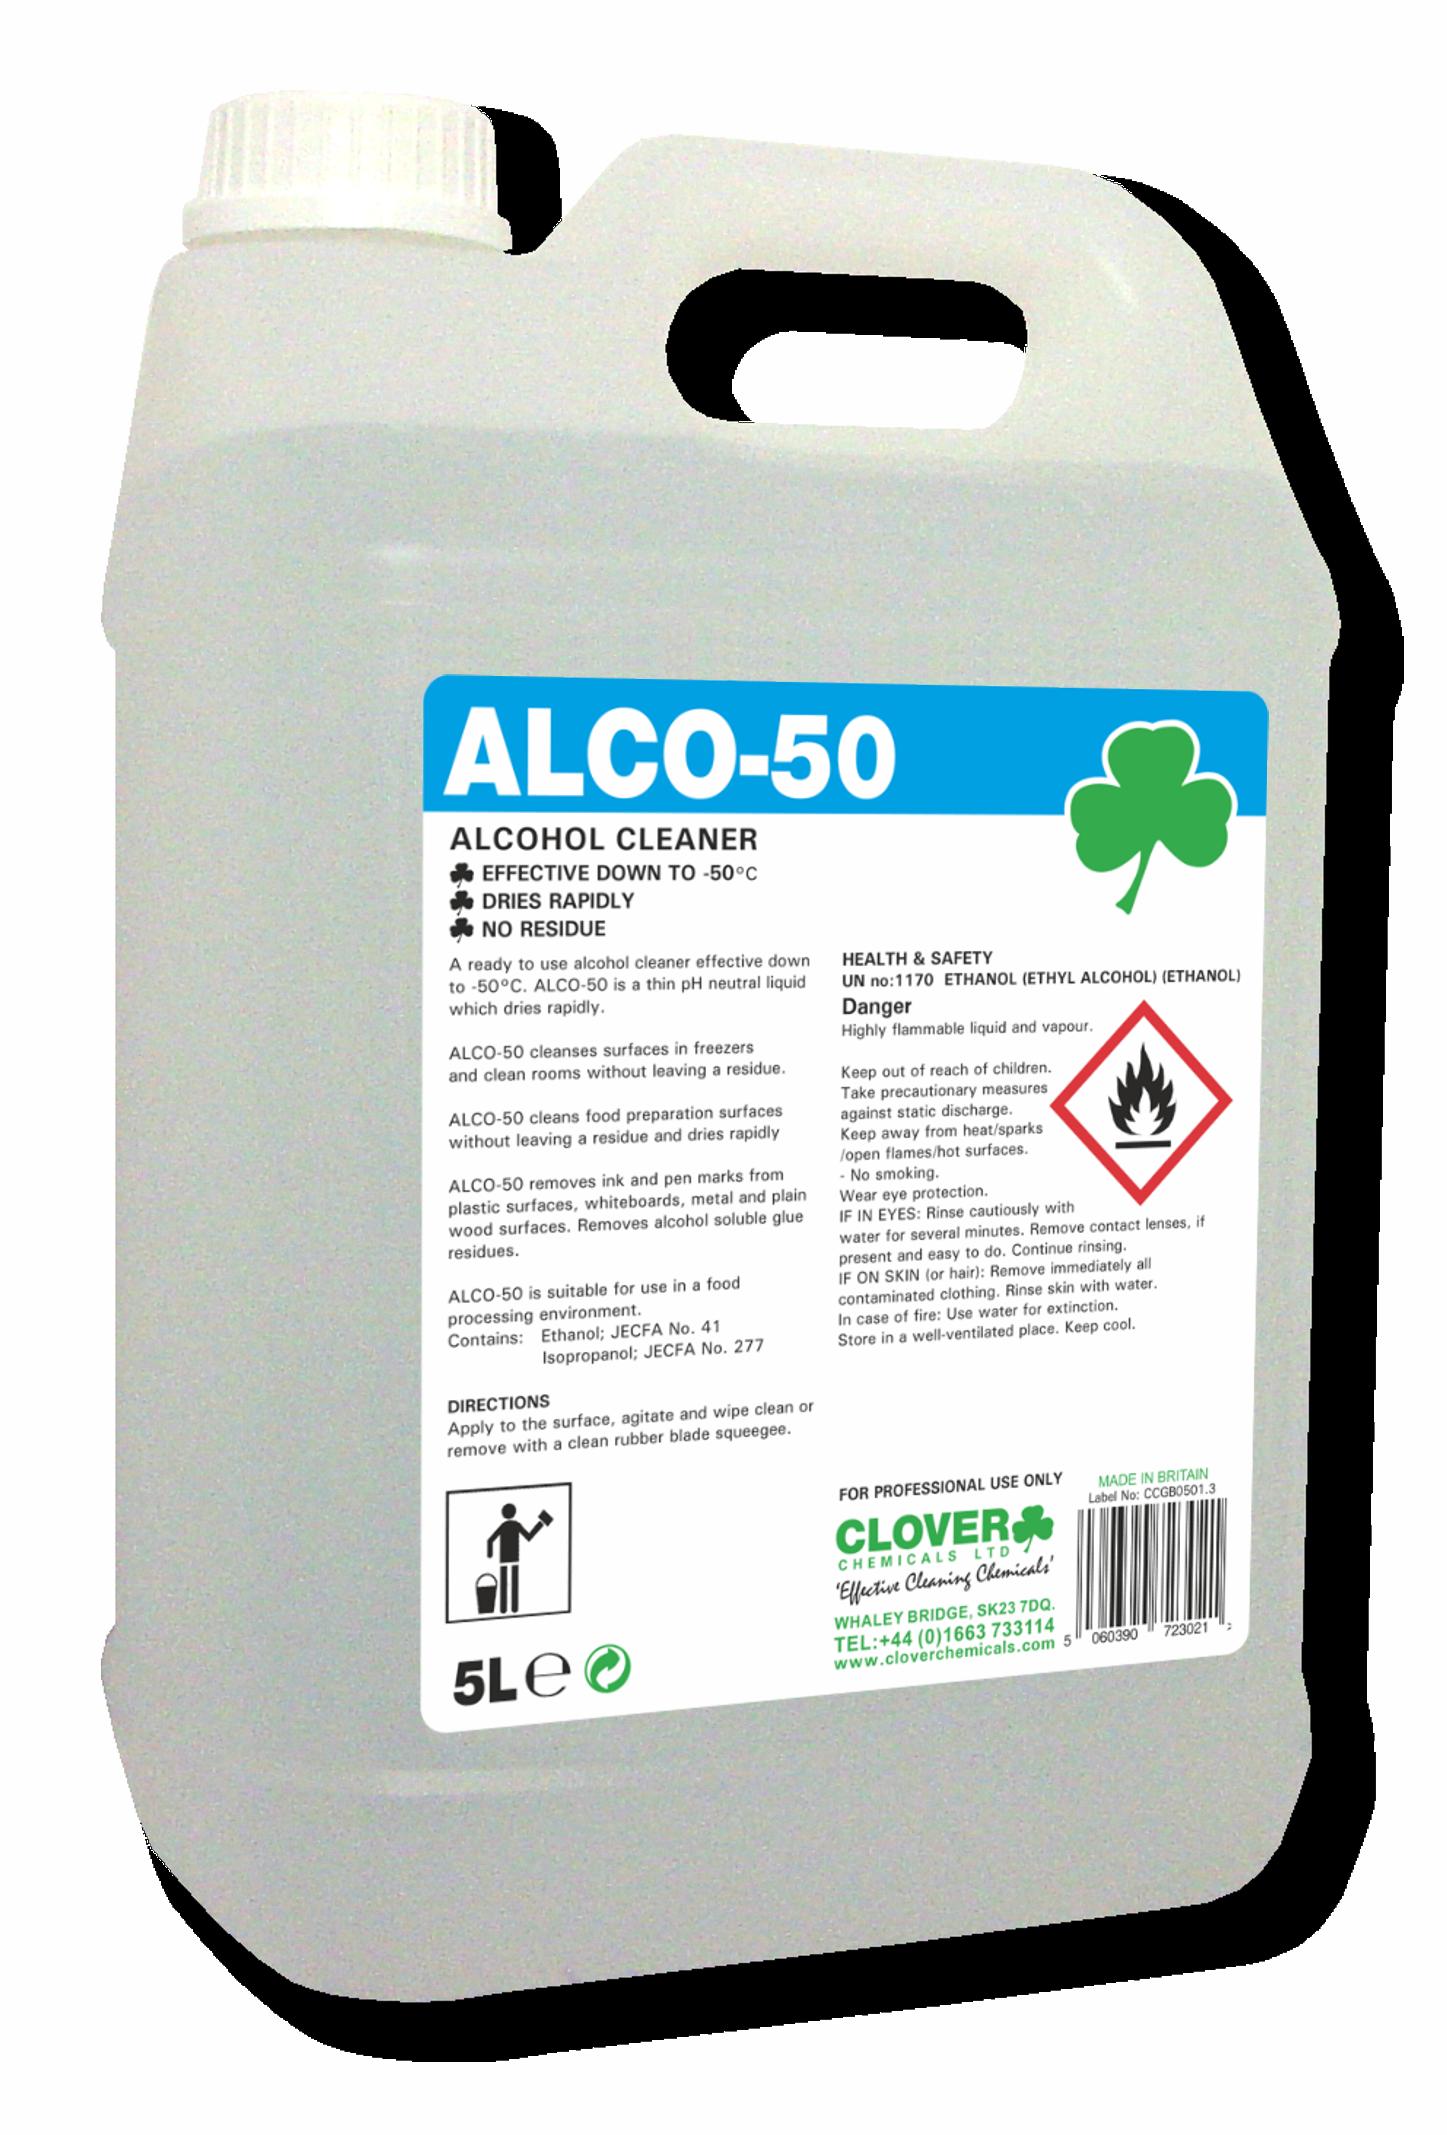 Clover Alco 50 Alcohol Cleaner